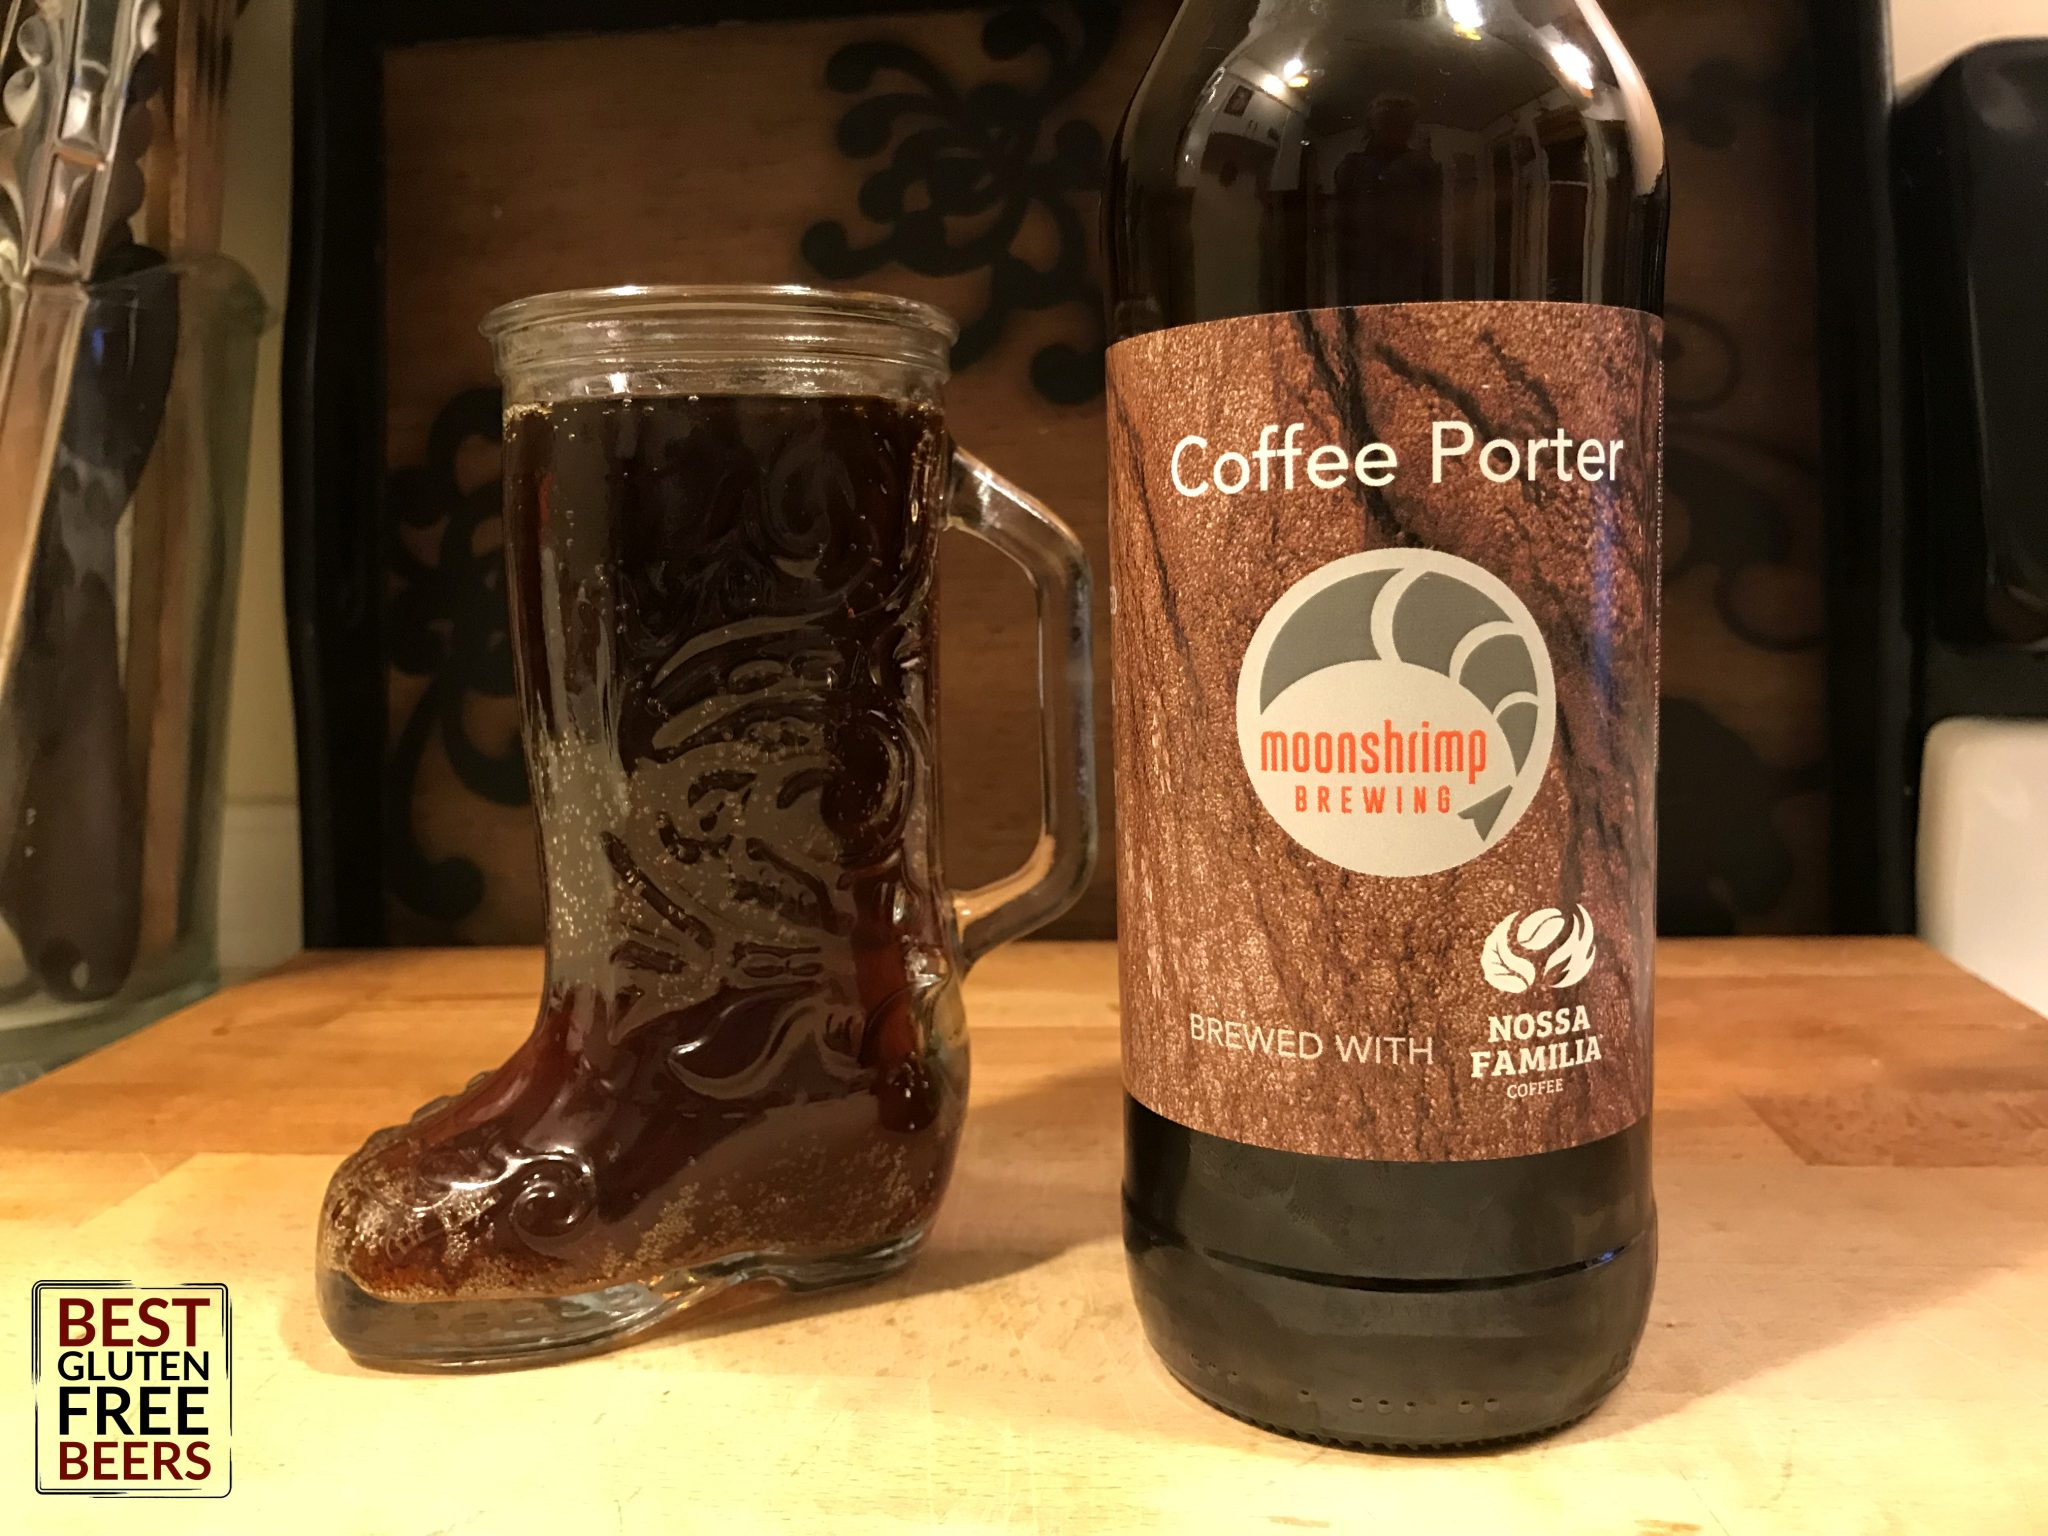 Moonshrimp brewing coffee porter gluten free beer review